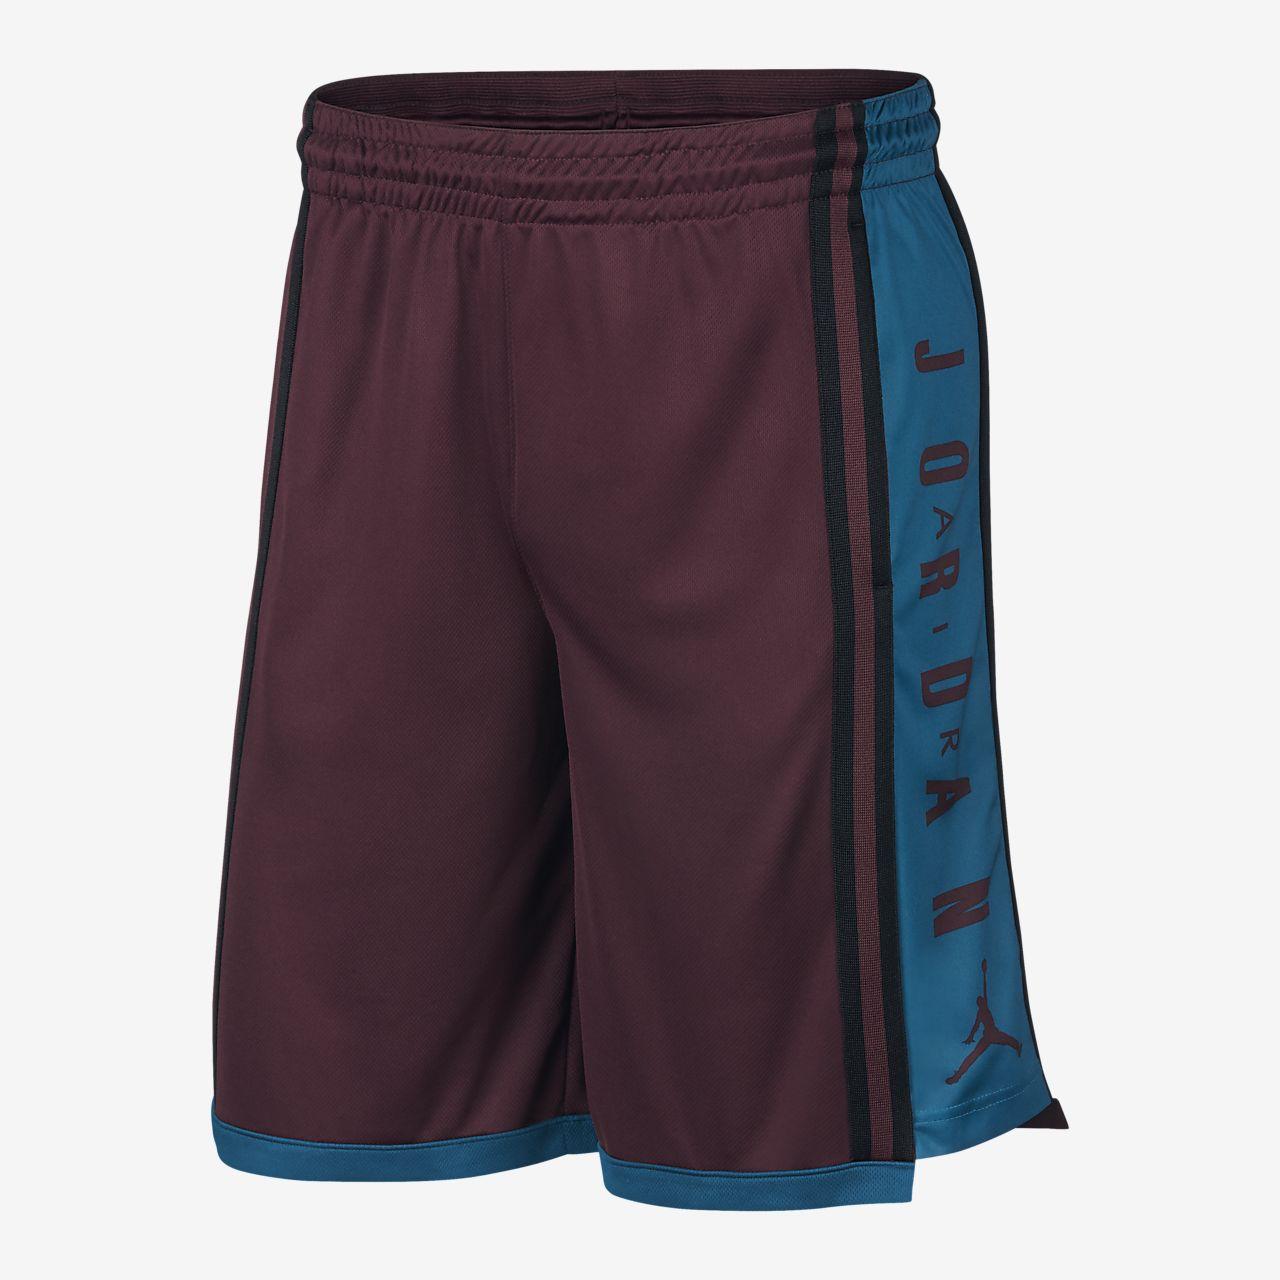 3bdbcd133dd8 Jordan HBR Men s Basketball Shorts. Nike.com LU